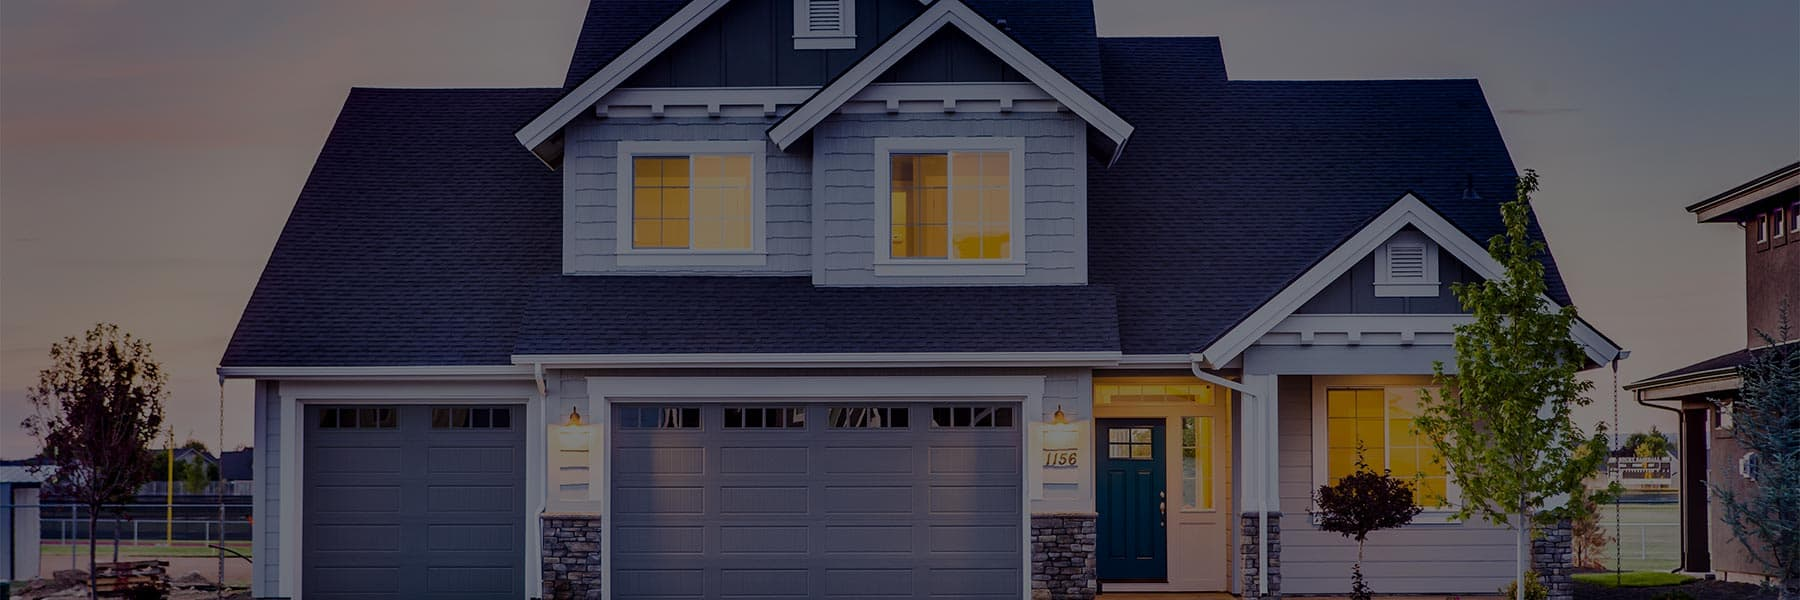 Rowat Insurance - outside of house